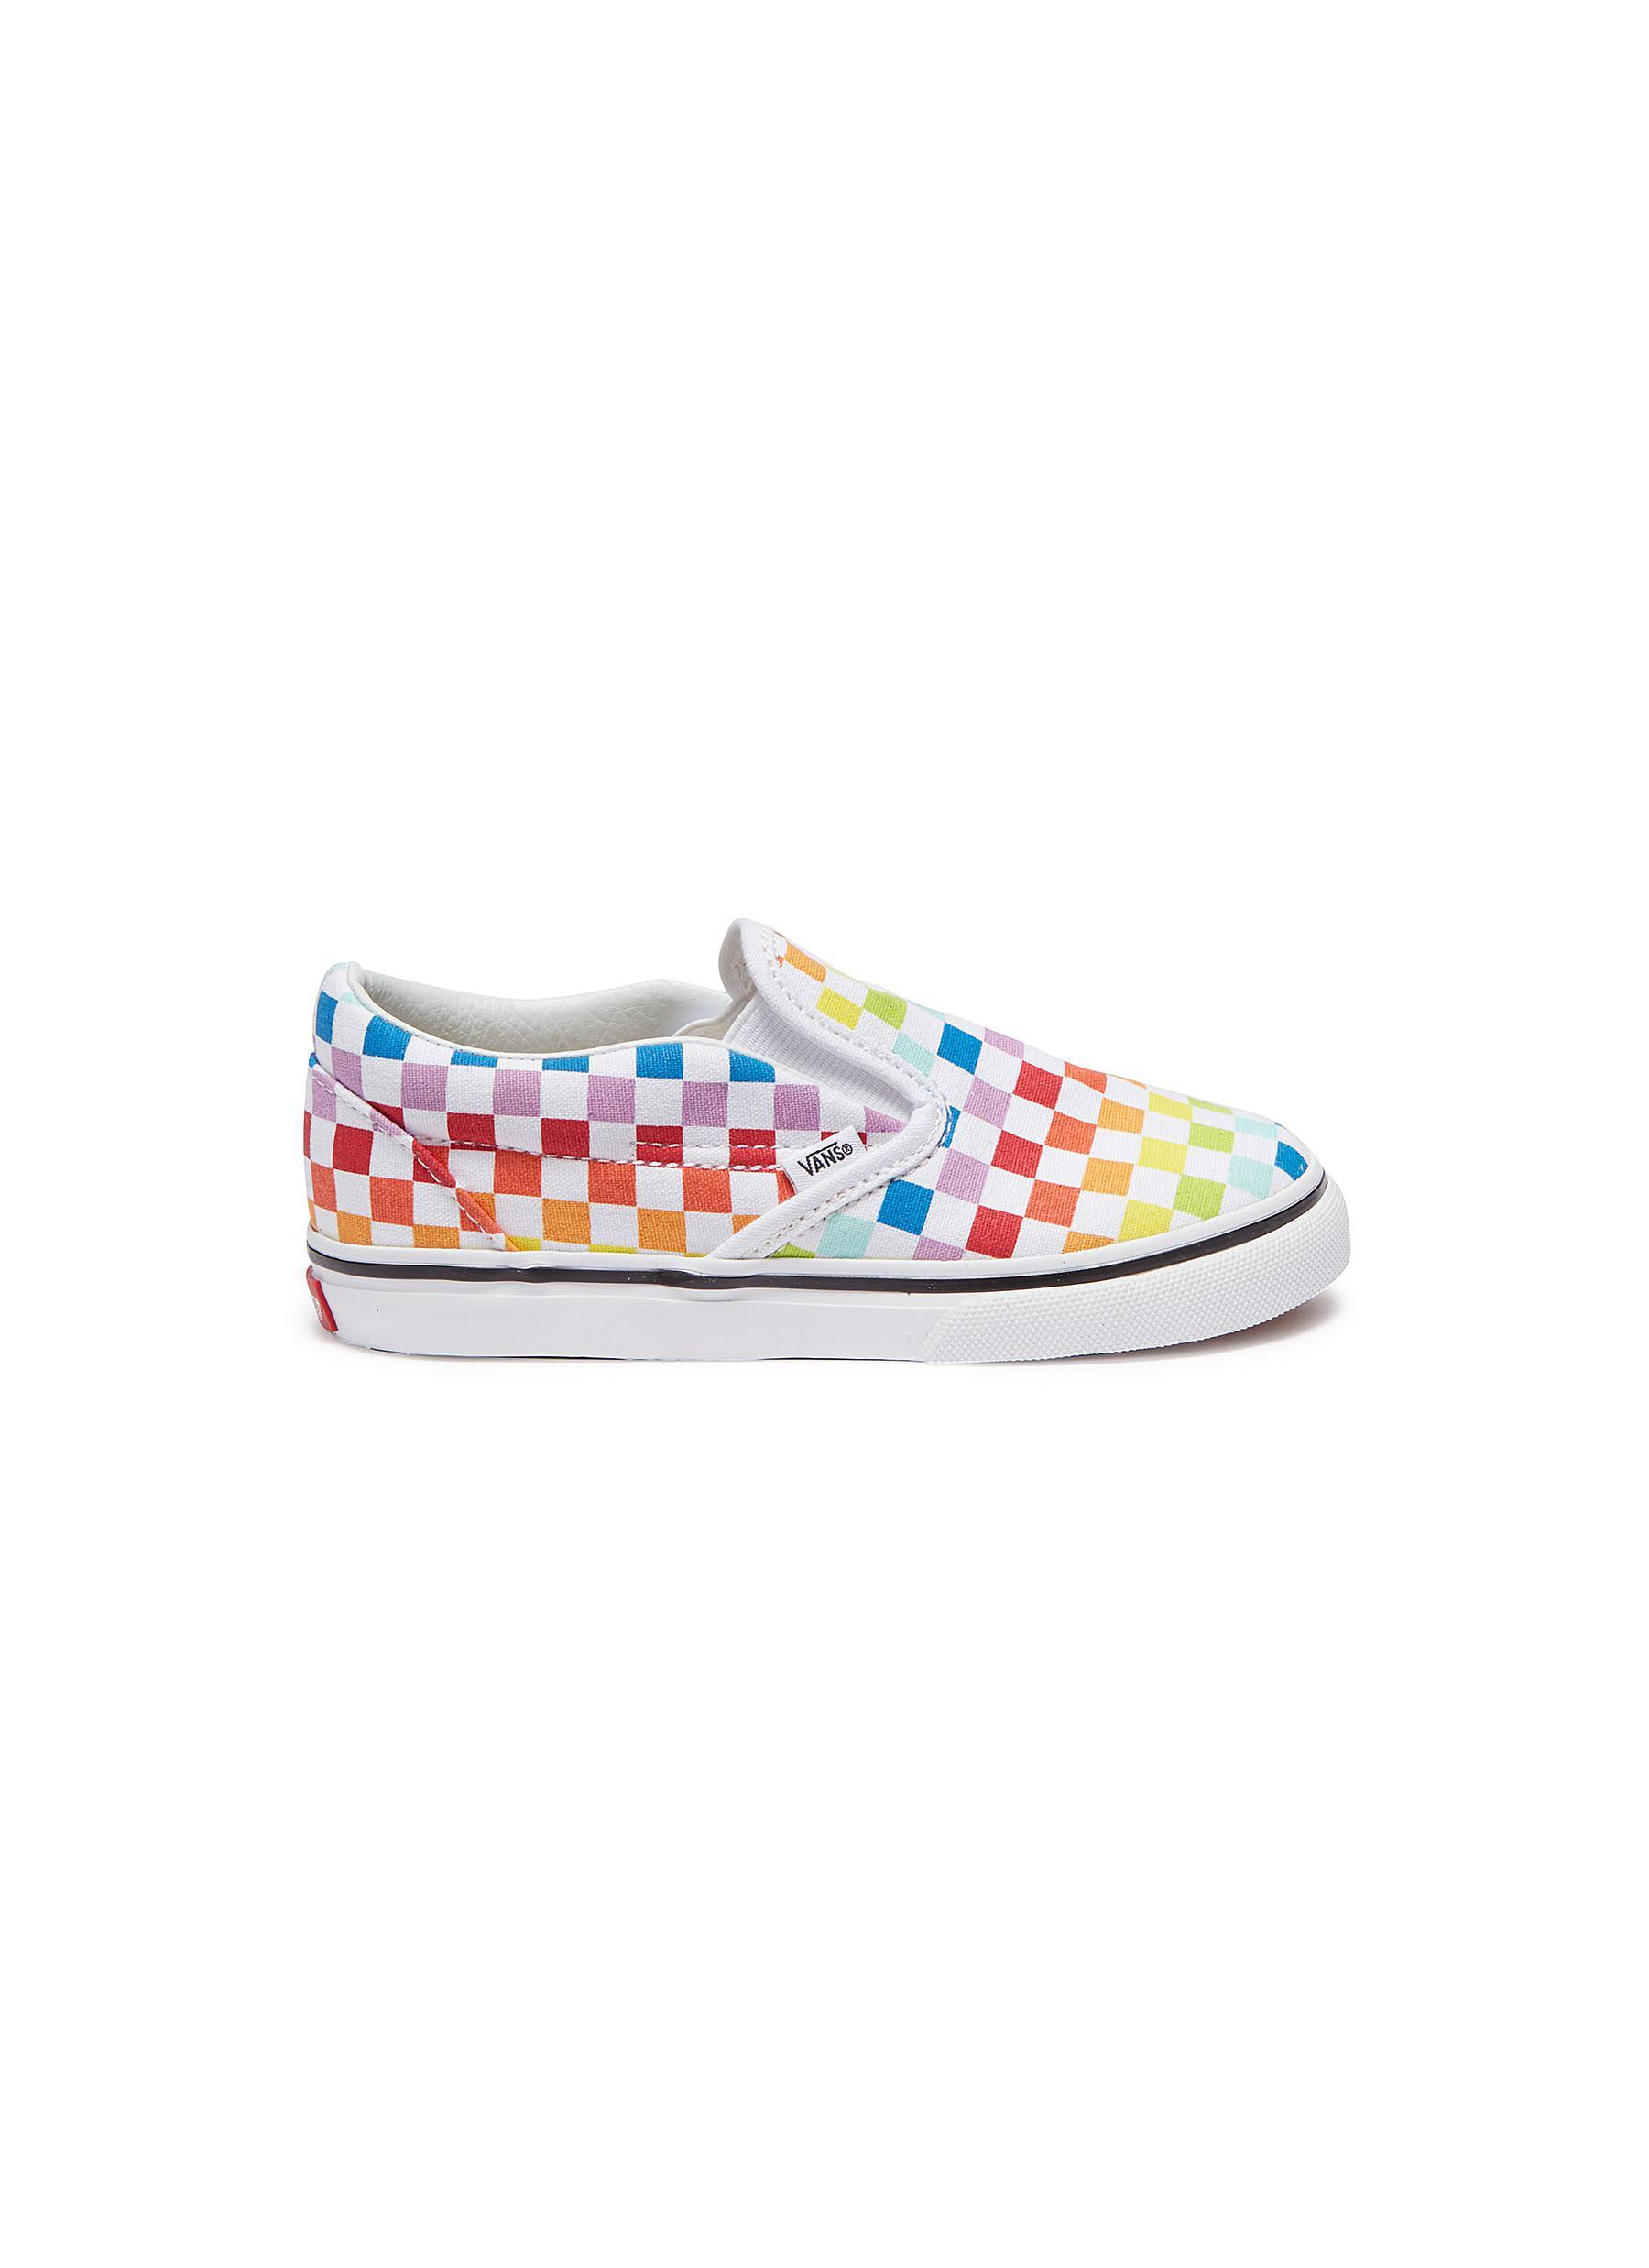 Vans Checkerboard Shirt Rainbow RLDM  RLDM